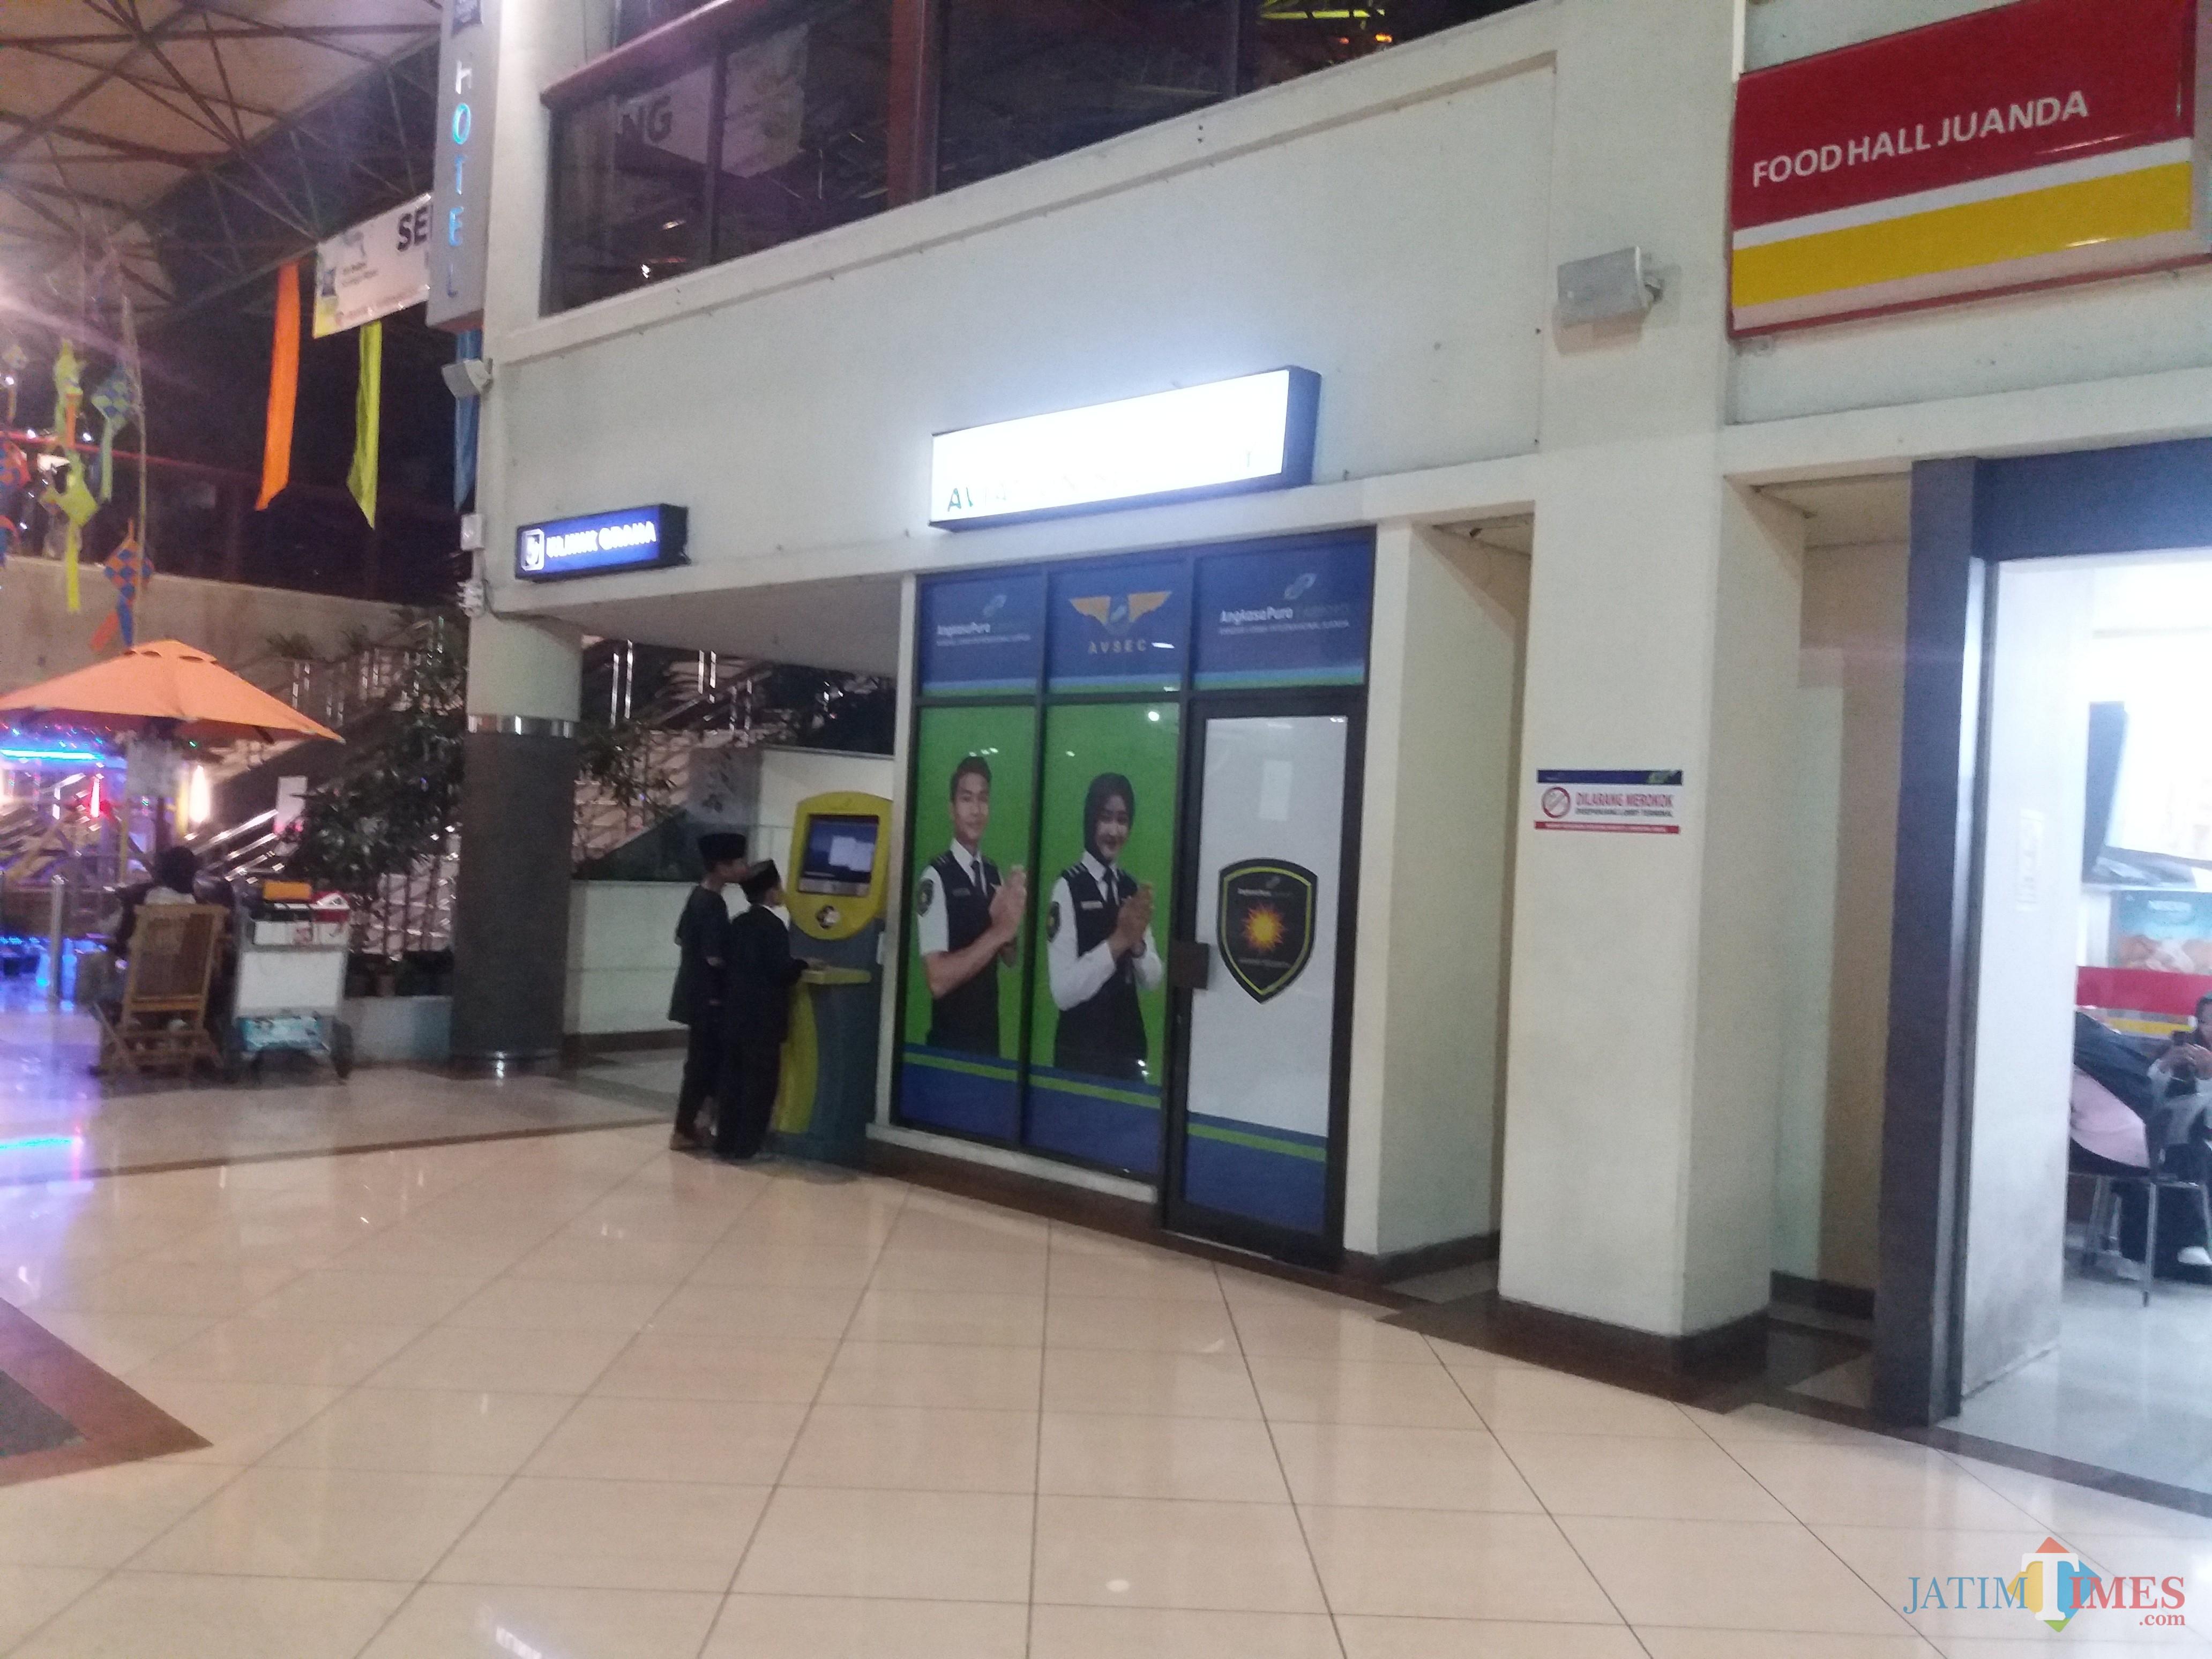 Posko Avsec di Bandara Juanda Surabaya